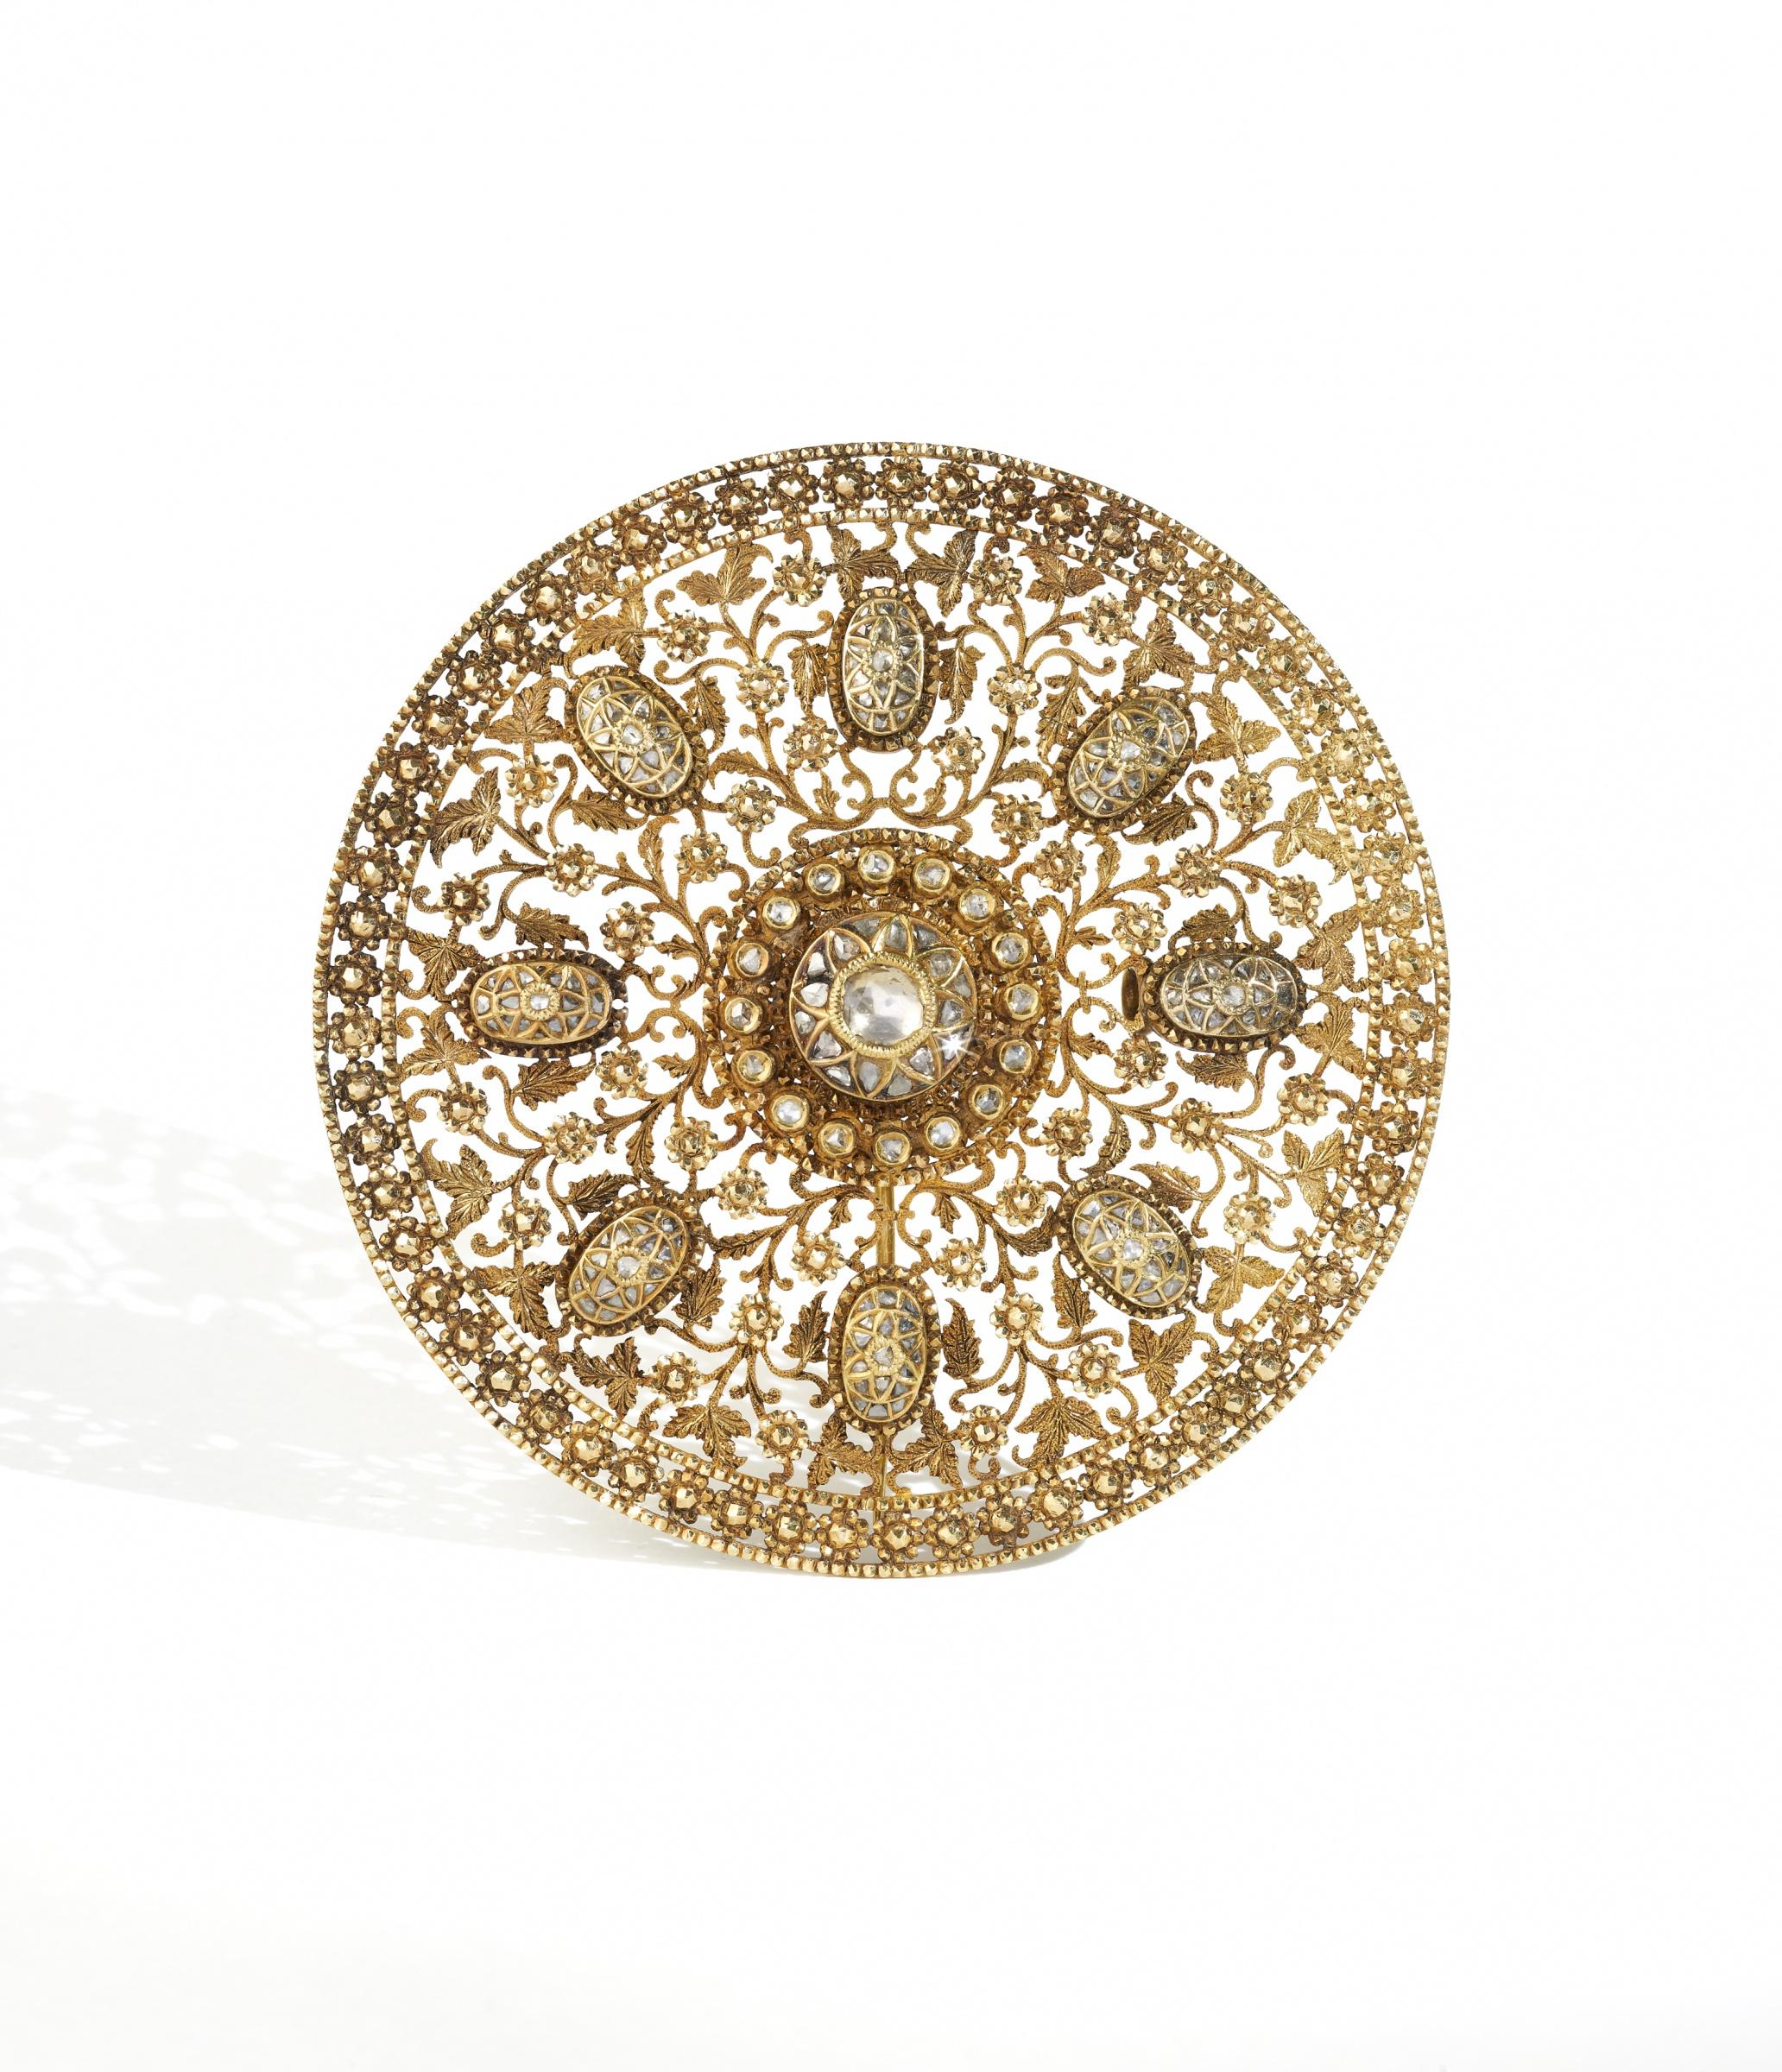 11._Gold_and_diamond_hair_ornament_ca_1900_Western_India.jpg-0aa7640